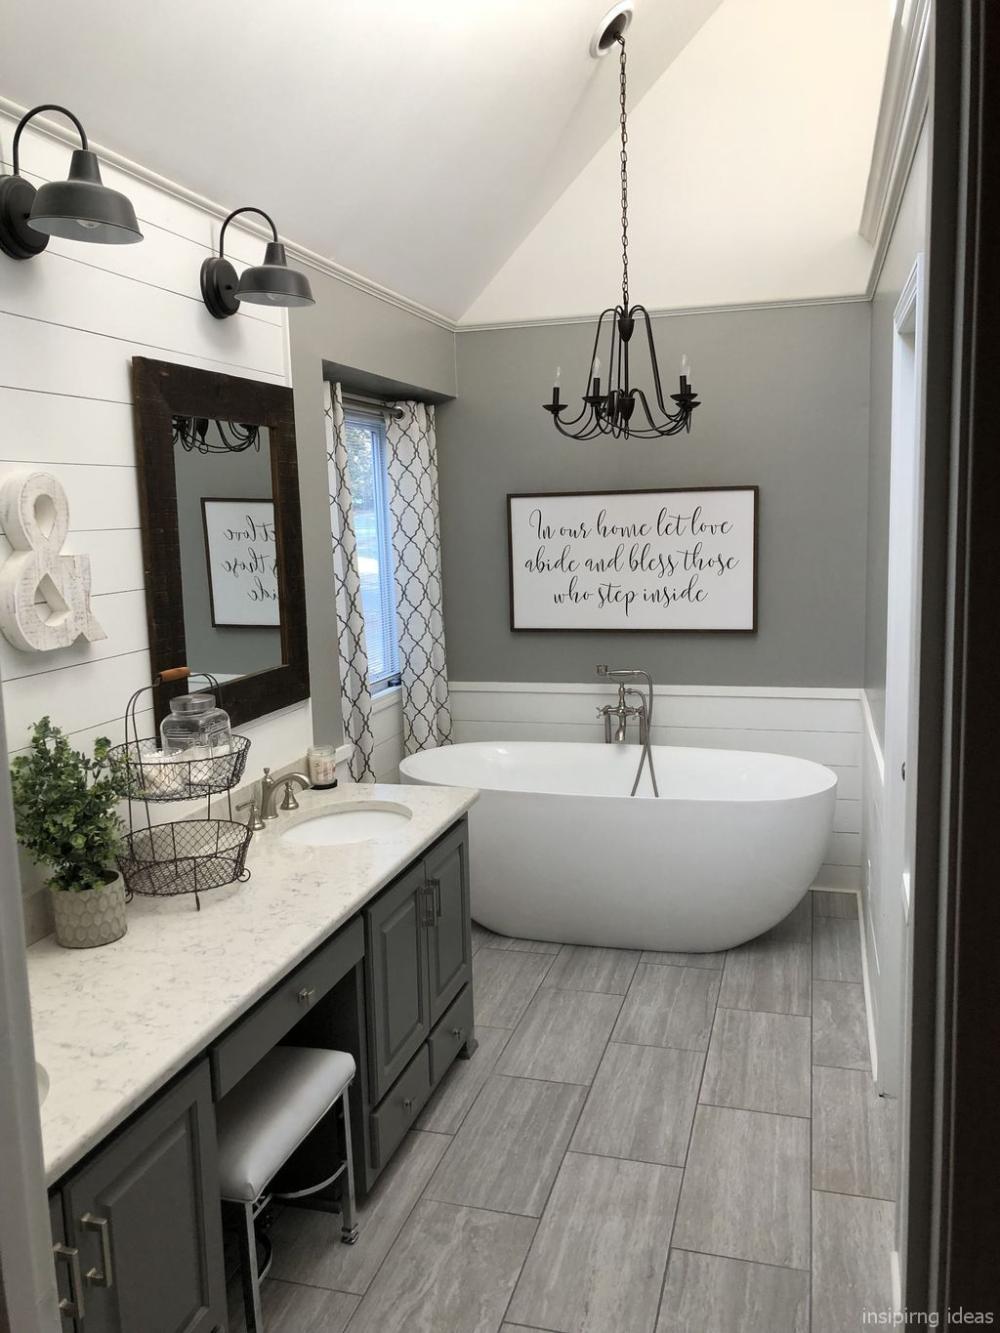 grey bathroom decor pinterest in 2020 | Small bathroom ...